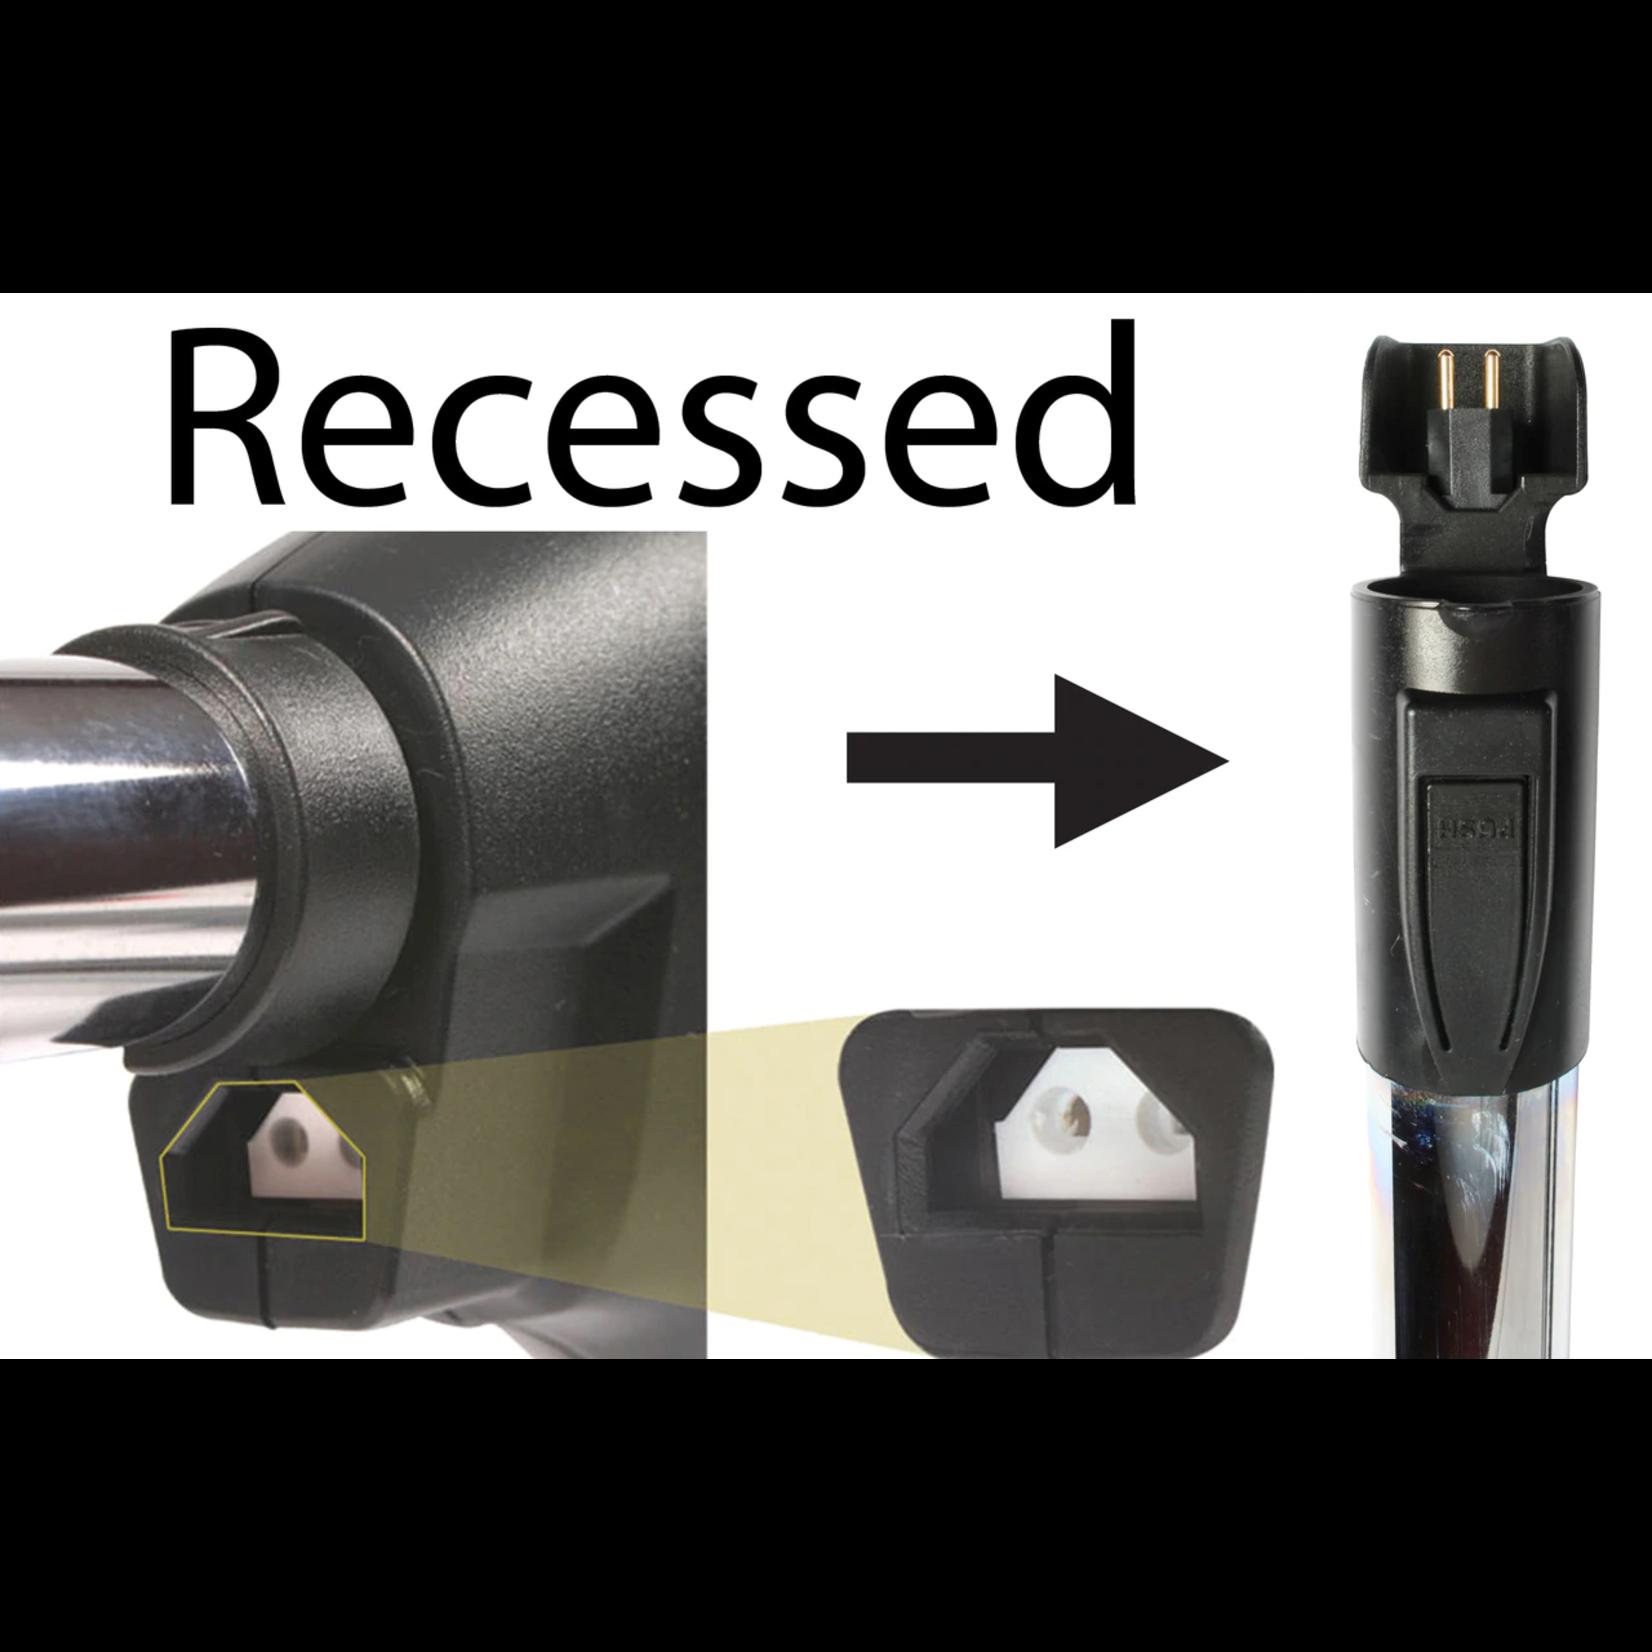 Centec Centec Telescopic Wand - Recessed w/Short Tube